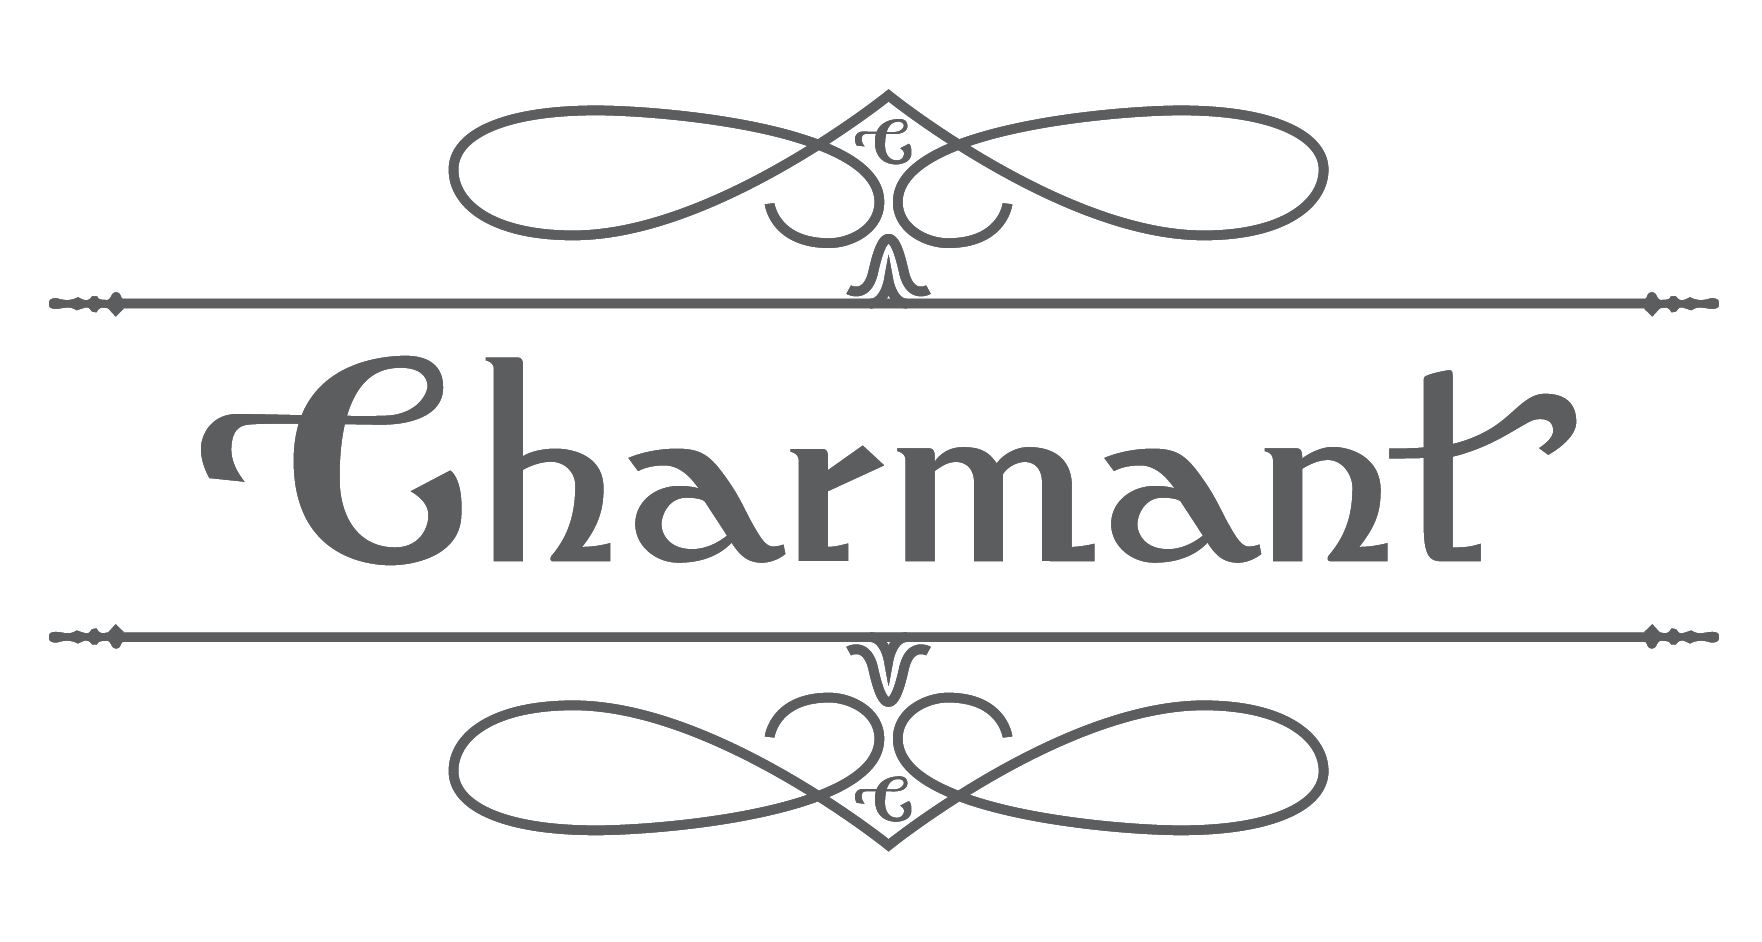 The Charmant